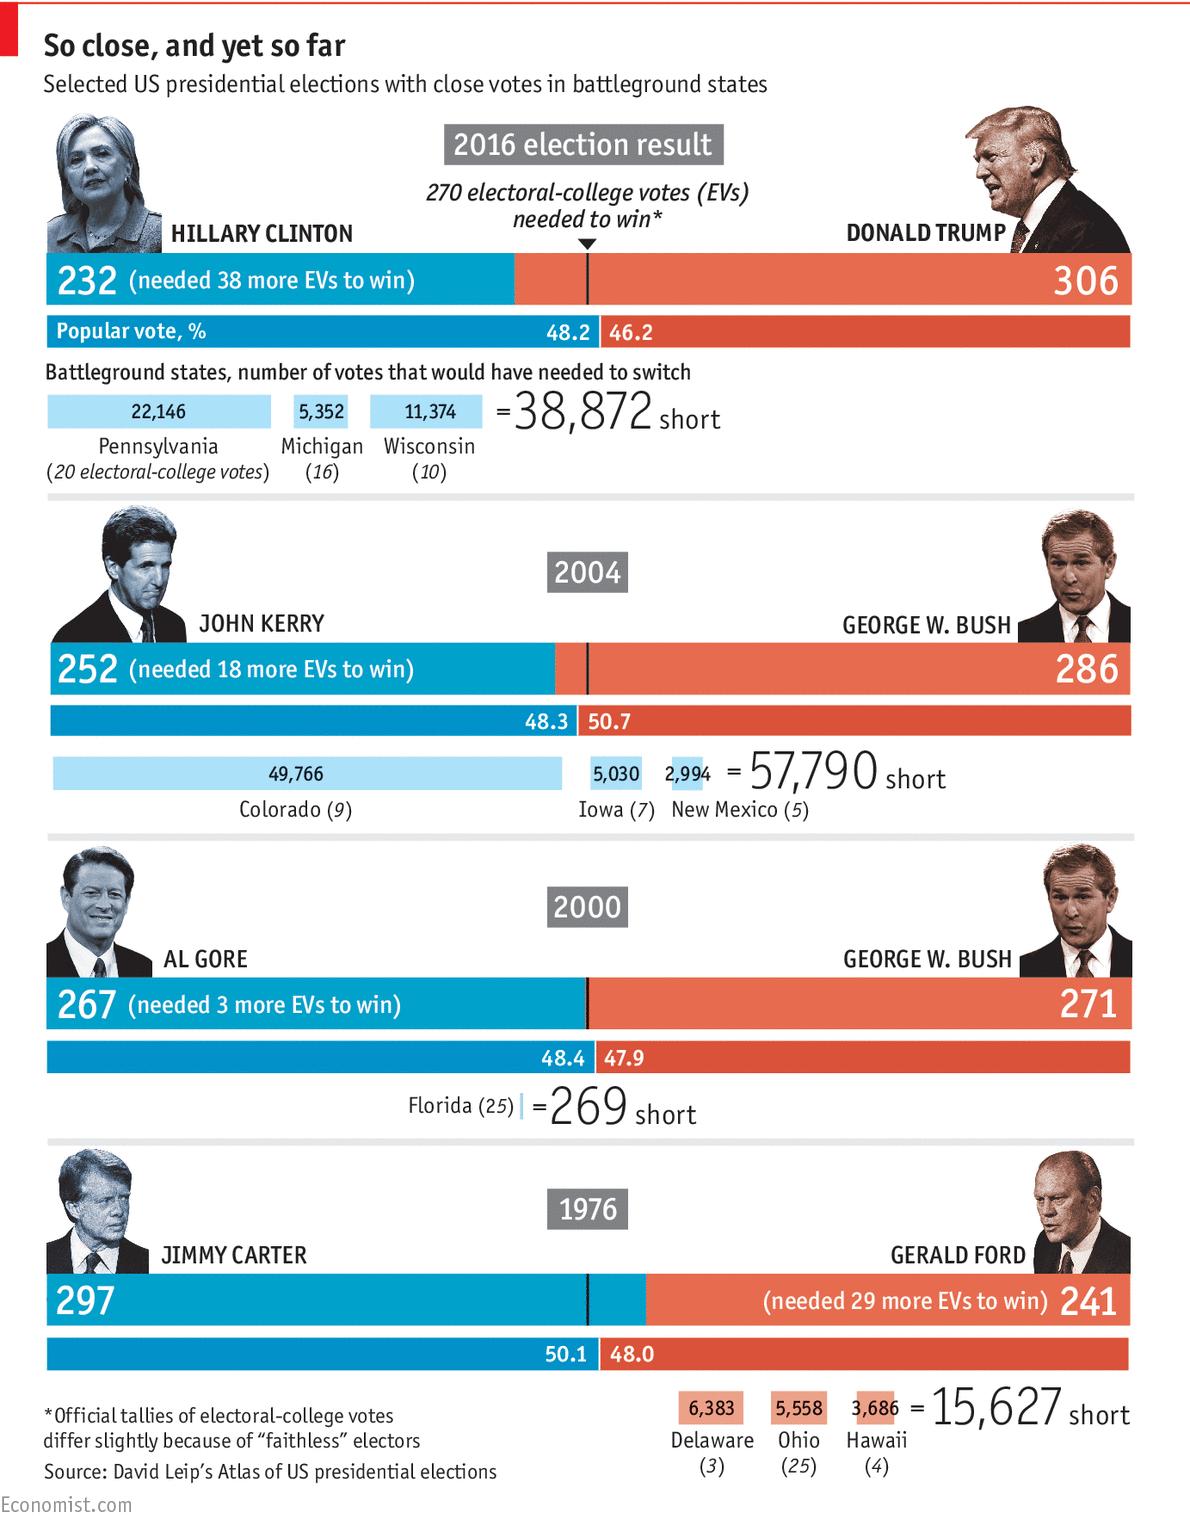 America's electoral college and the popular vote